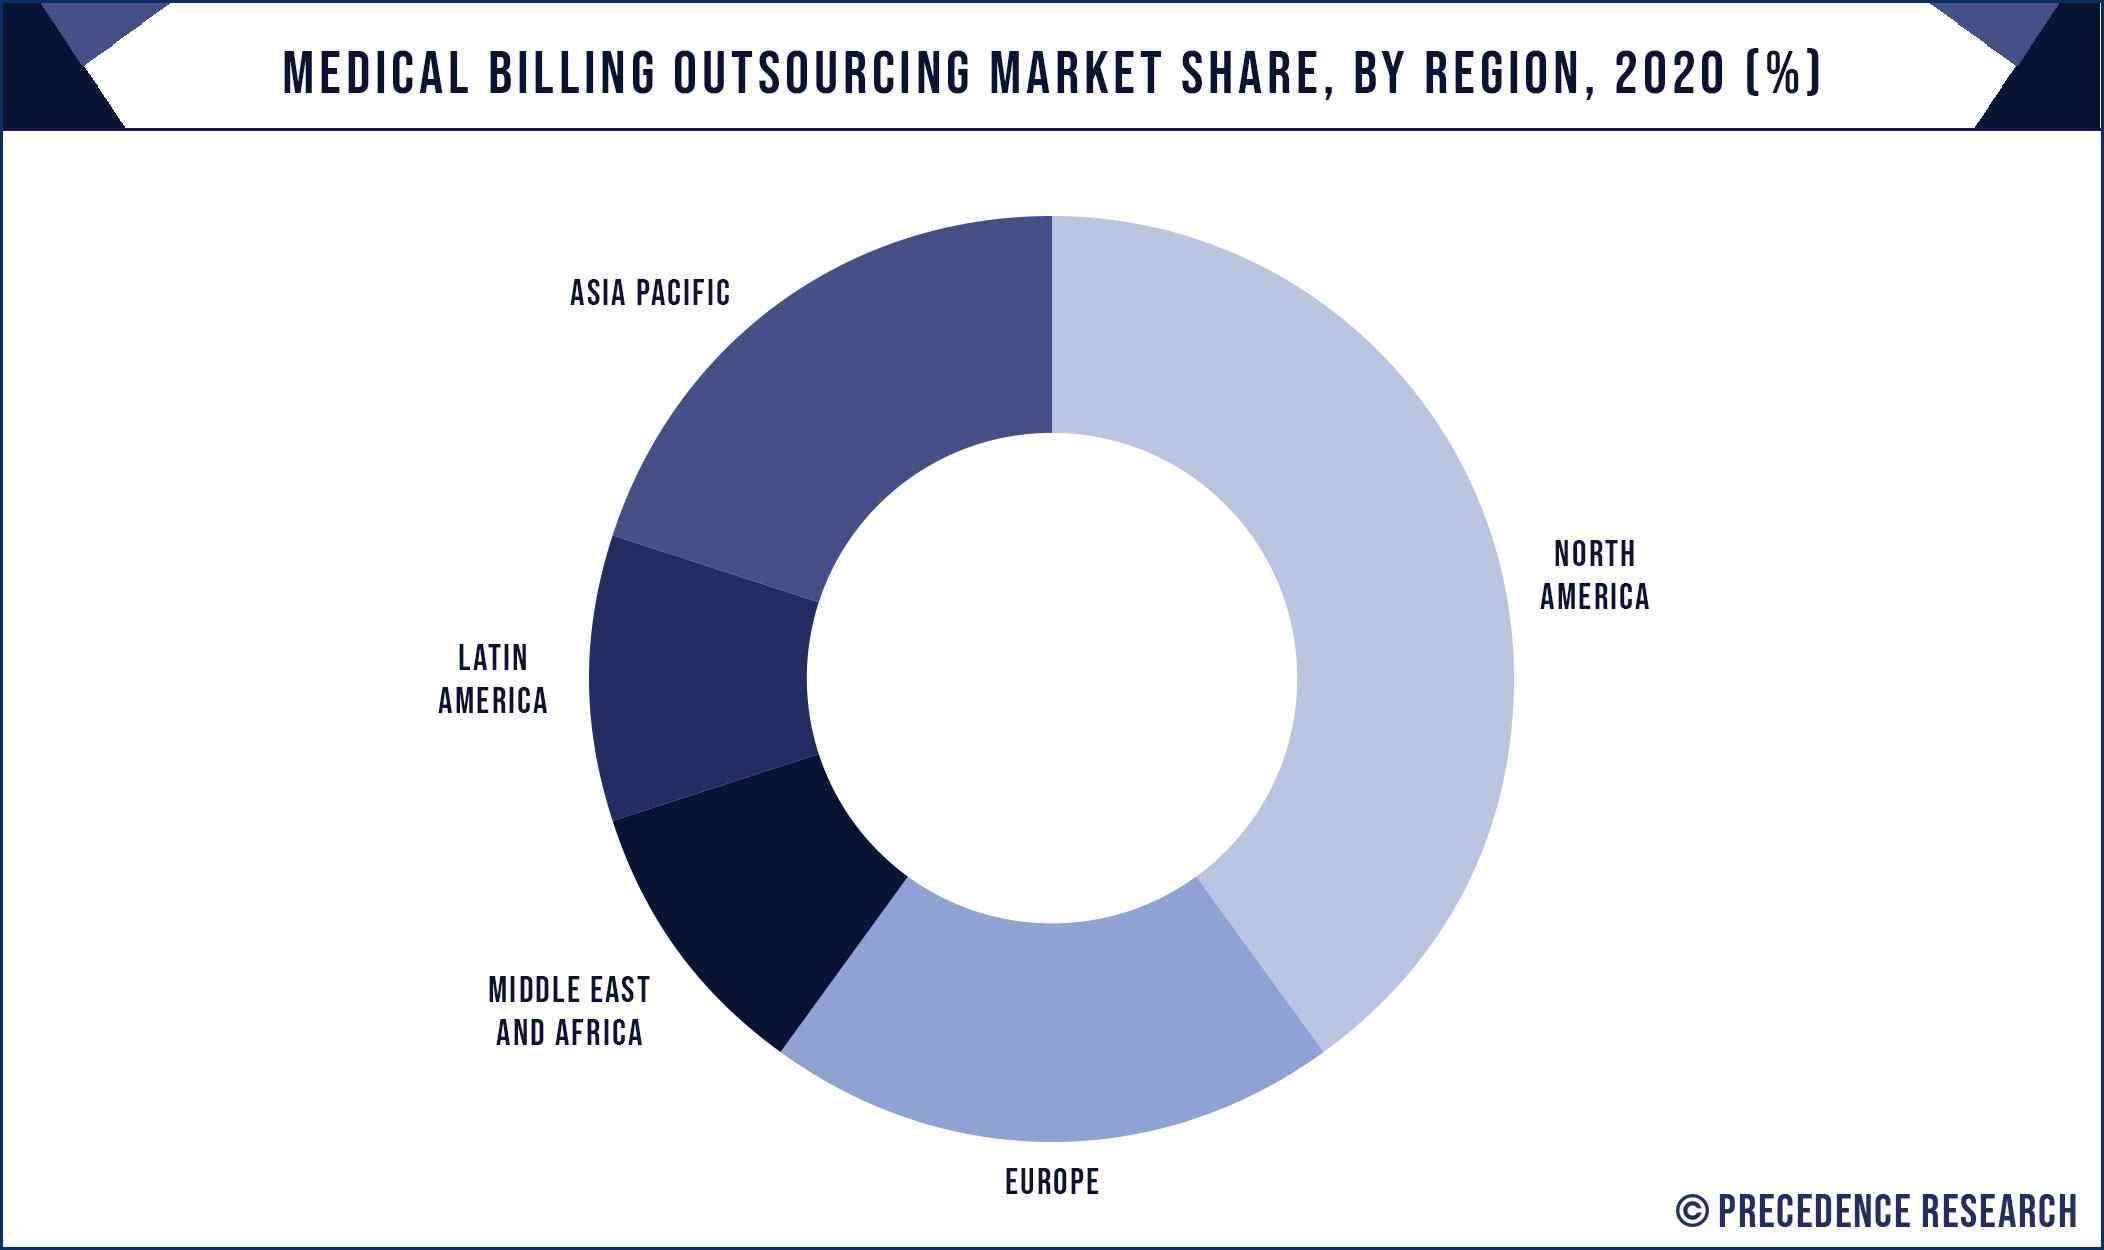 Medical Billing Outsourcing Market Share, By Region, 2020 (%)